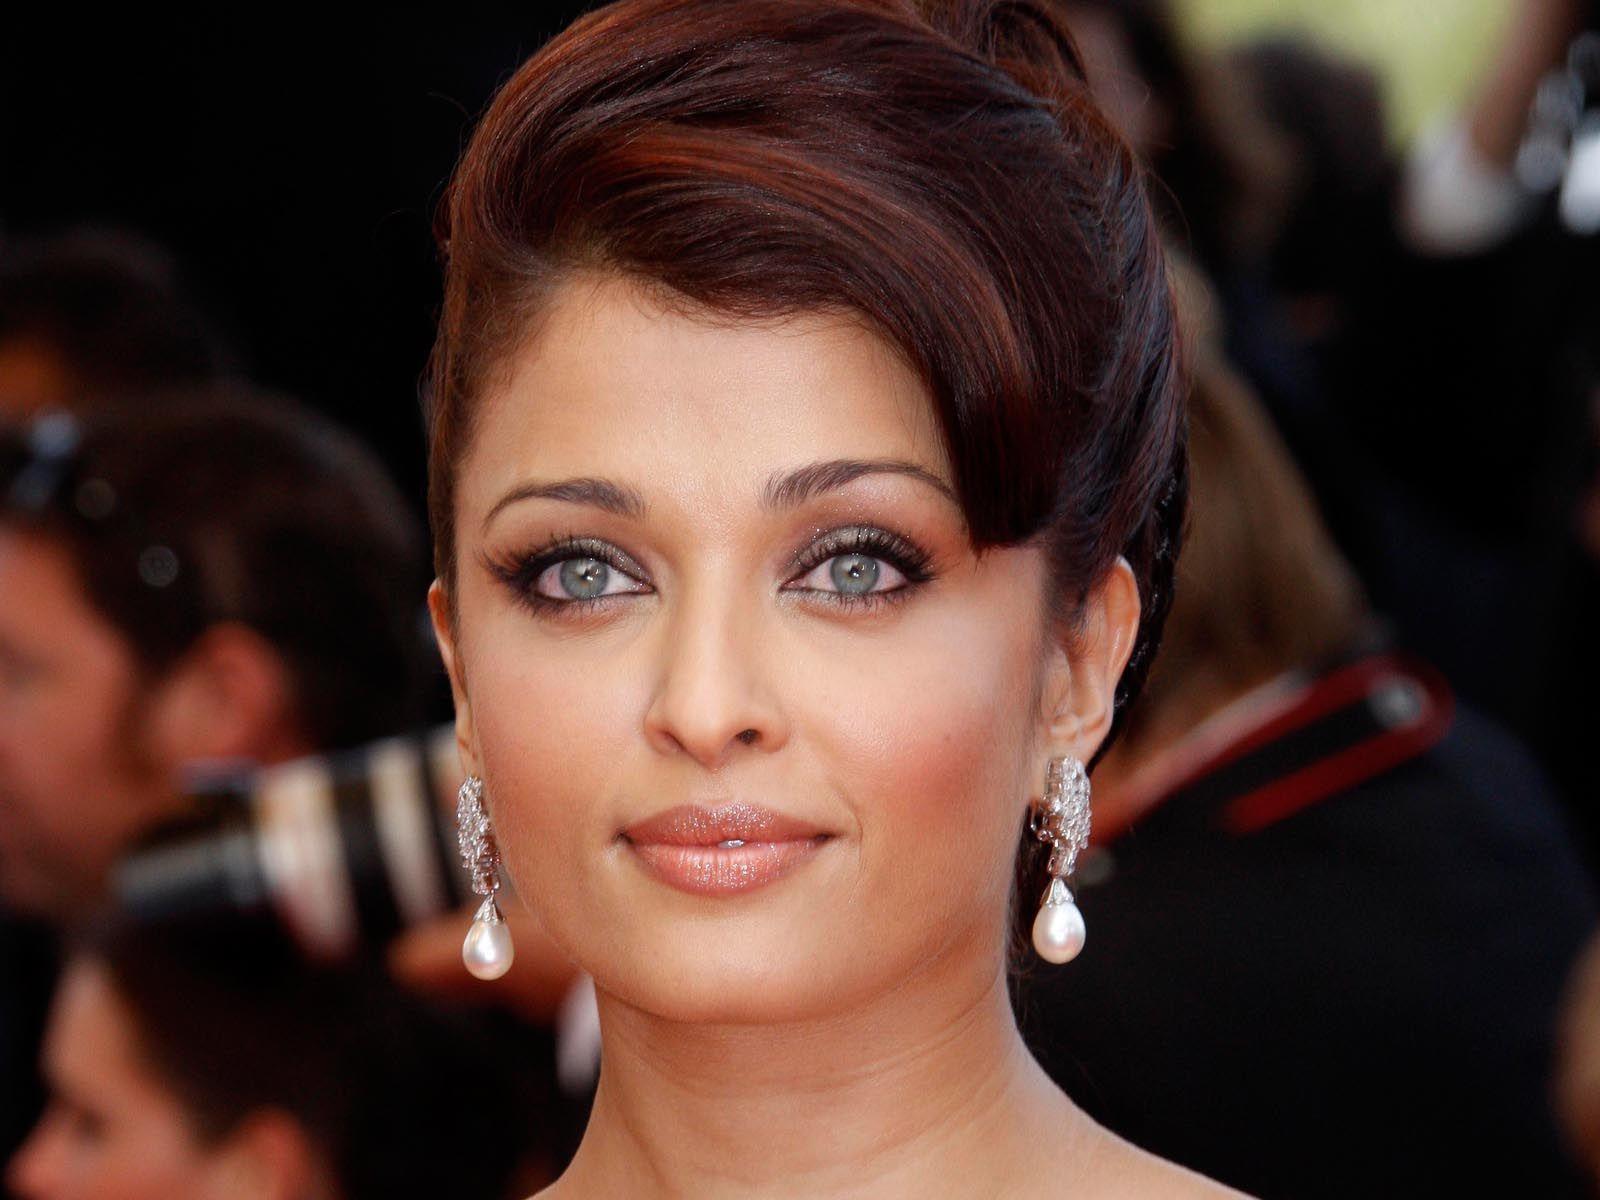 Hot Bollywood Actress 18+ - Home | Facebook